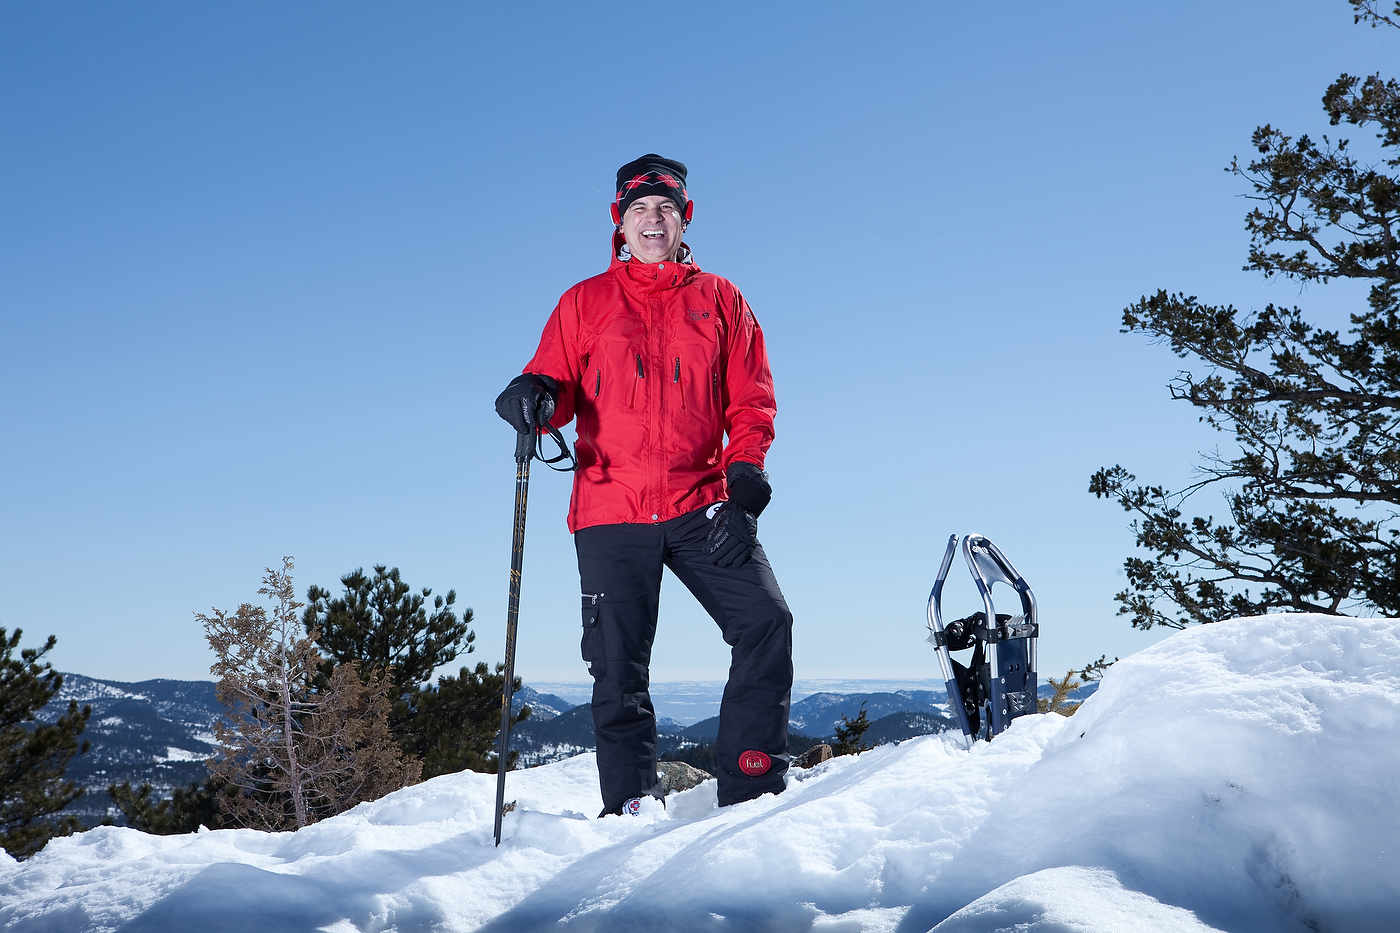 Mike, mountaineer, Colorado, for Advanced Bionics.